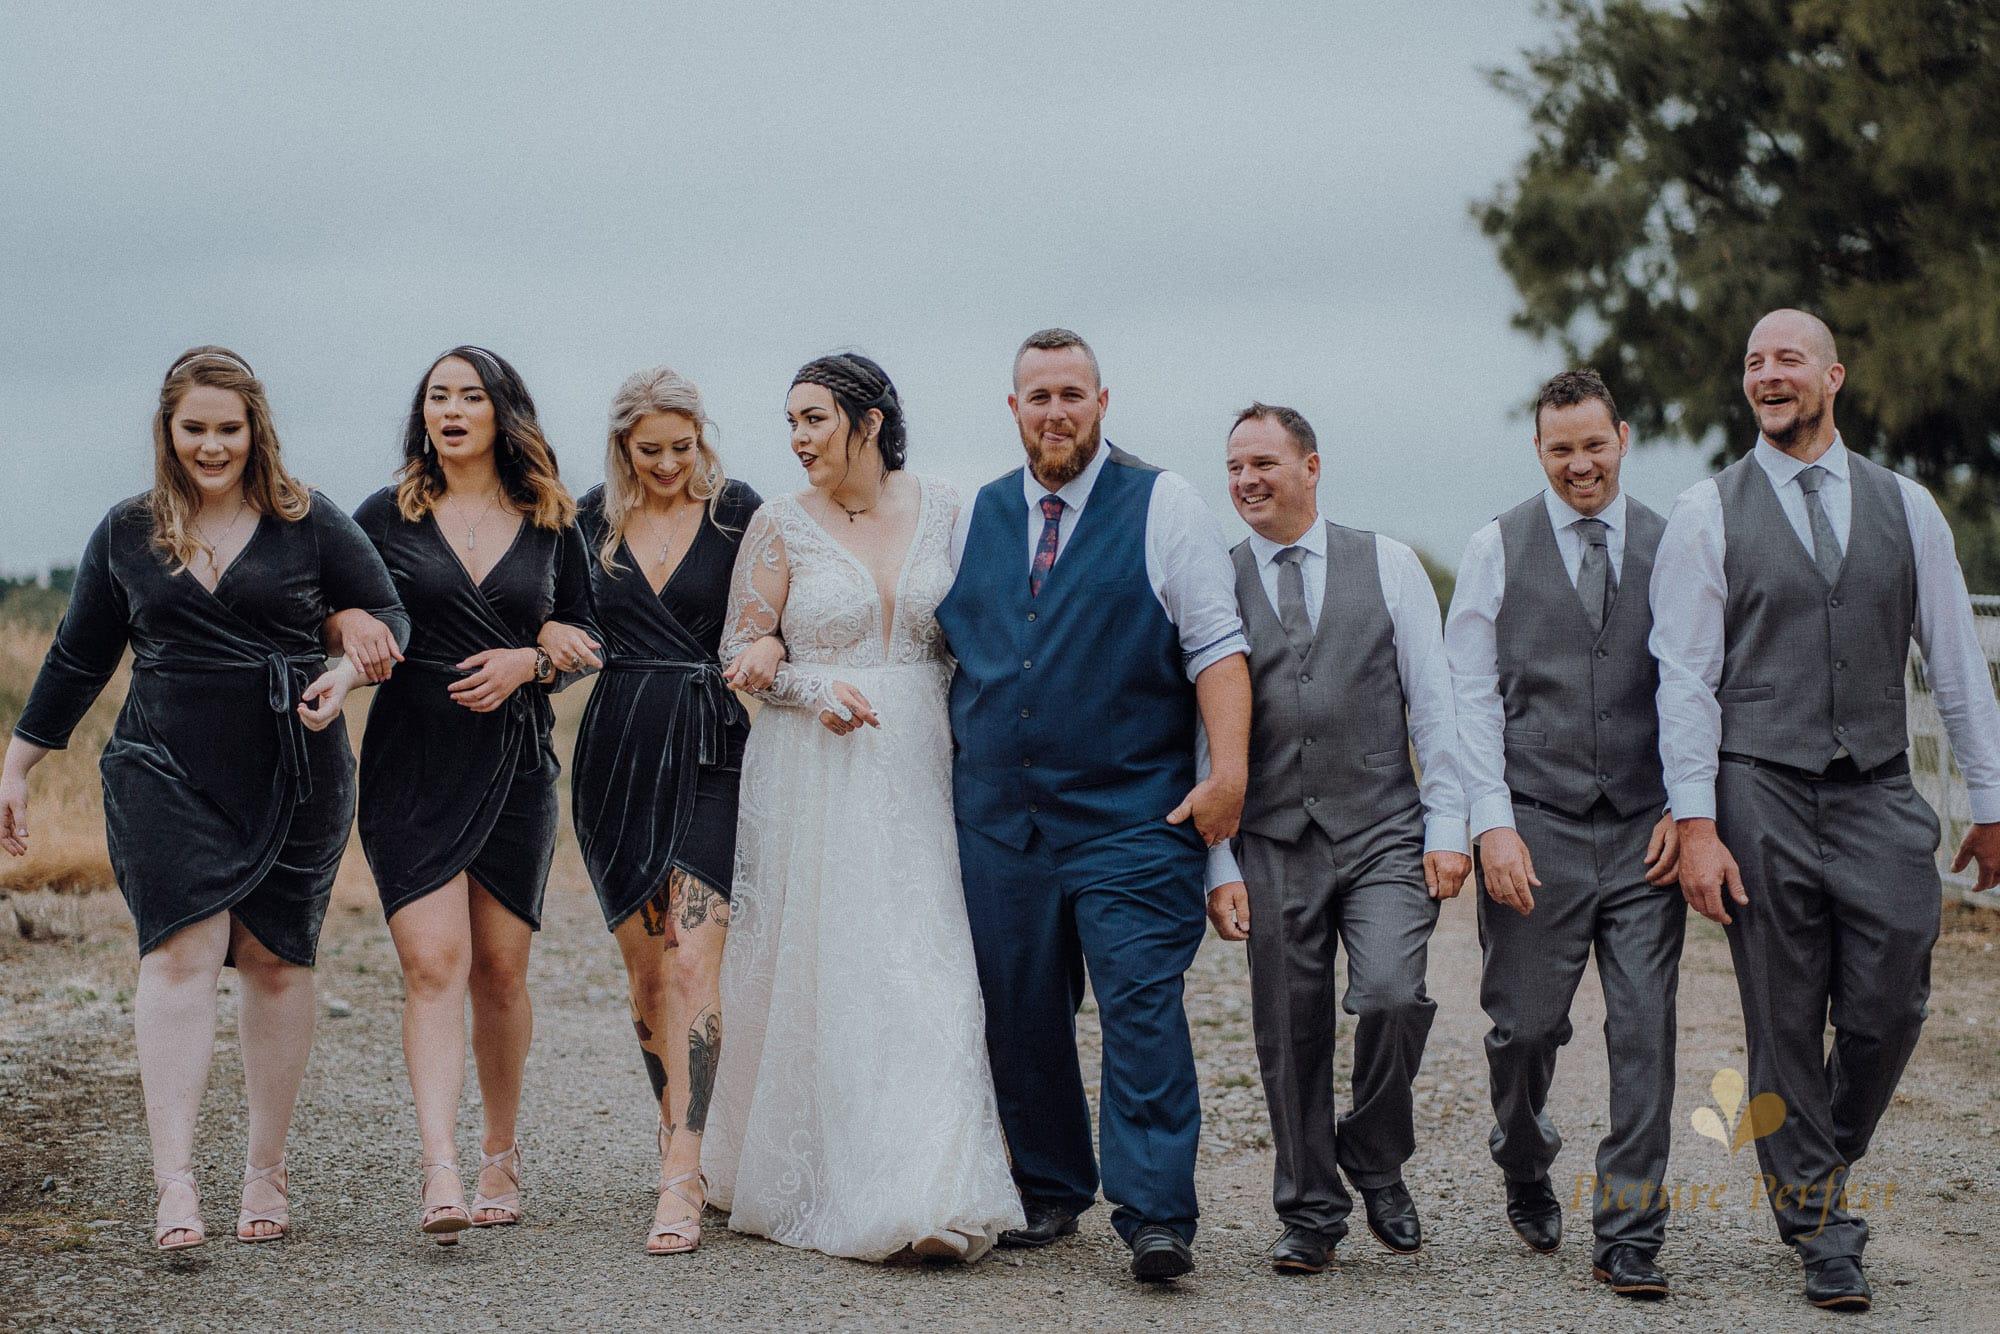 Sjaan wedding photos 3222